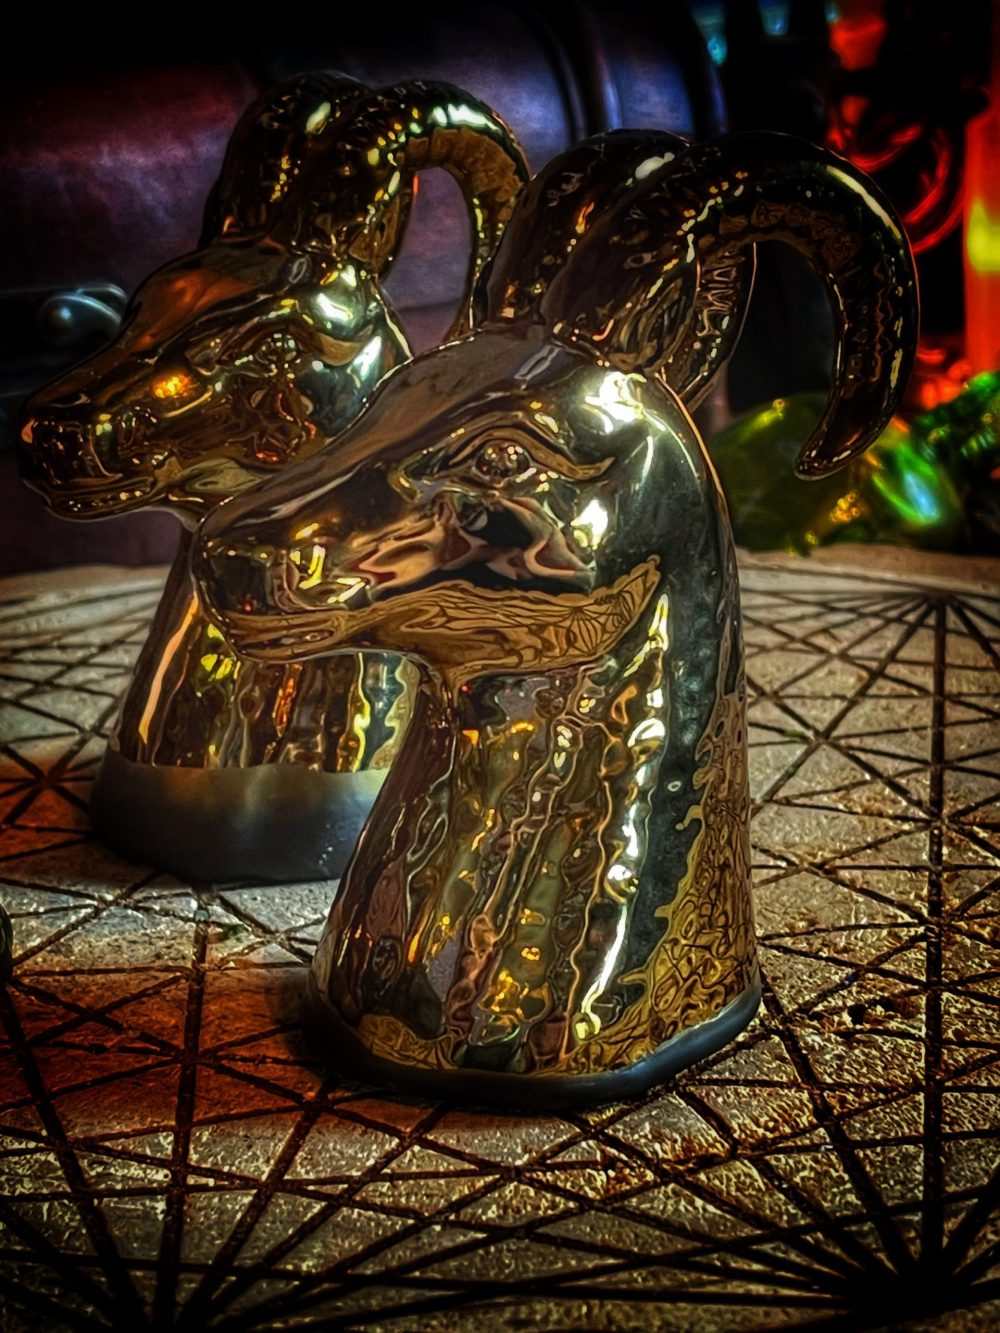 The Golden Goat of Plenty Witch Bottle